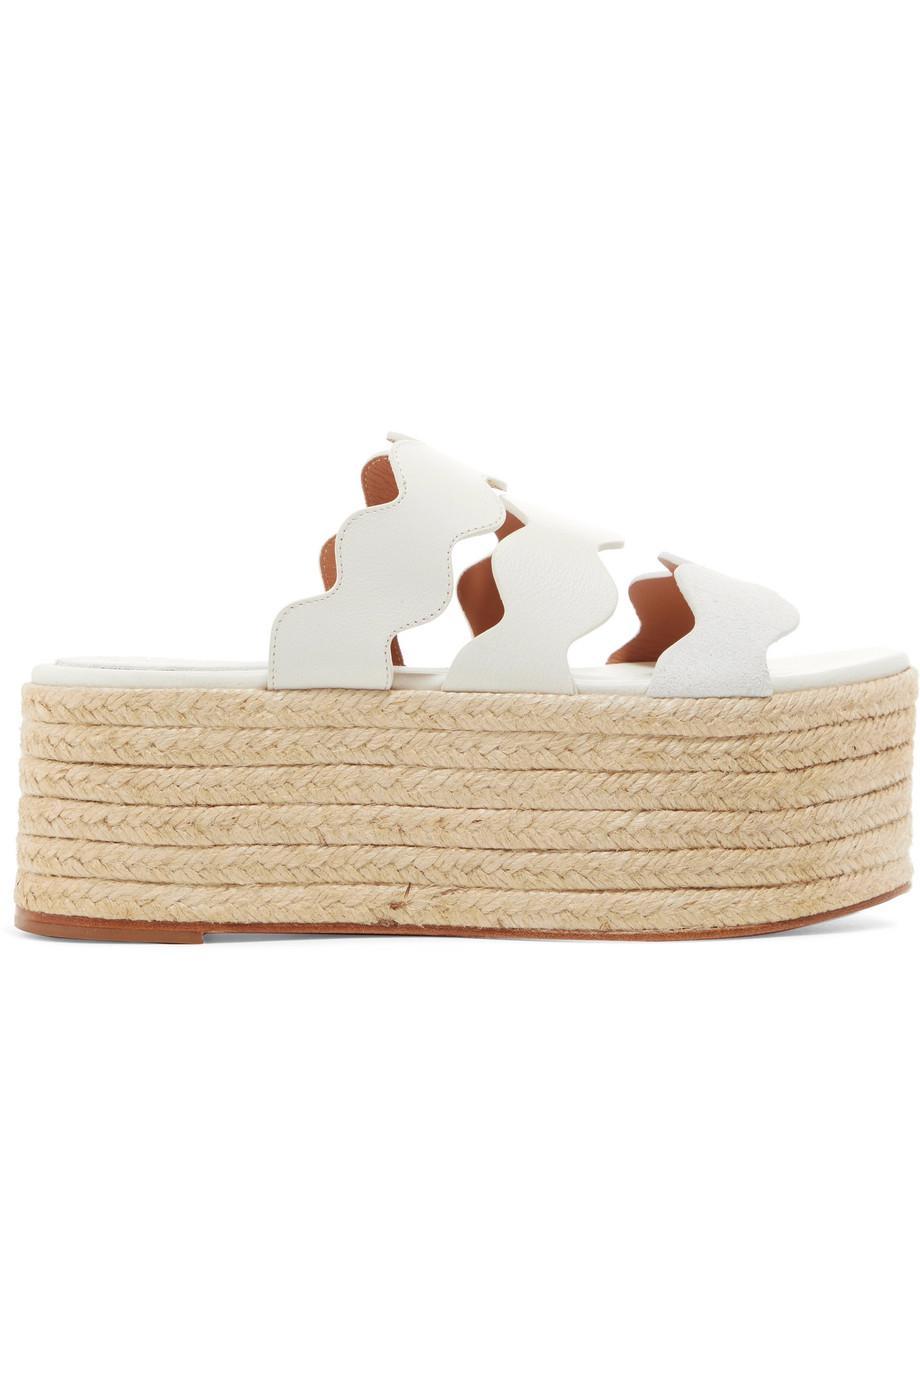 Lauren Scalloped Suede And Textured-leather Espadrille Platform Slides - White Chlo EdR6HWruzB